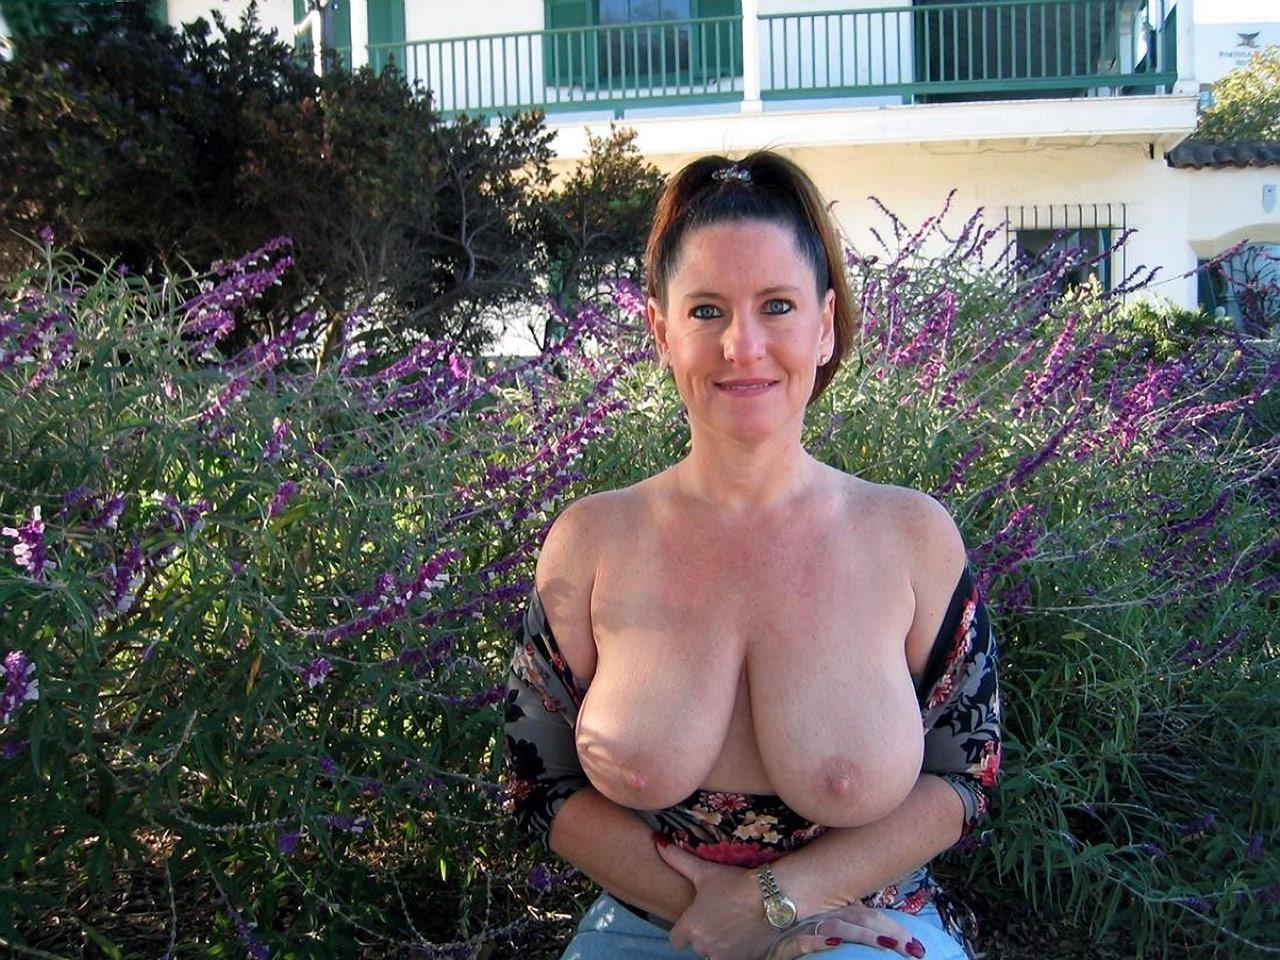 Mary j blige nude bikini